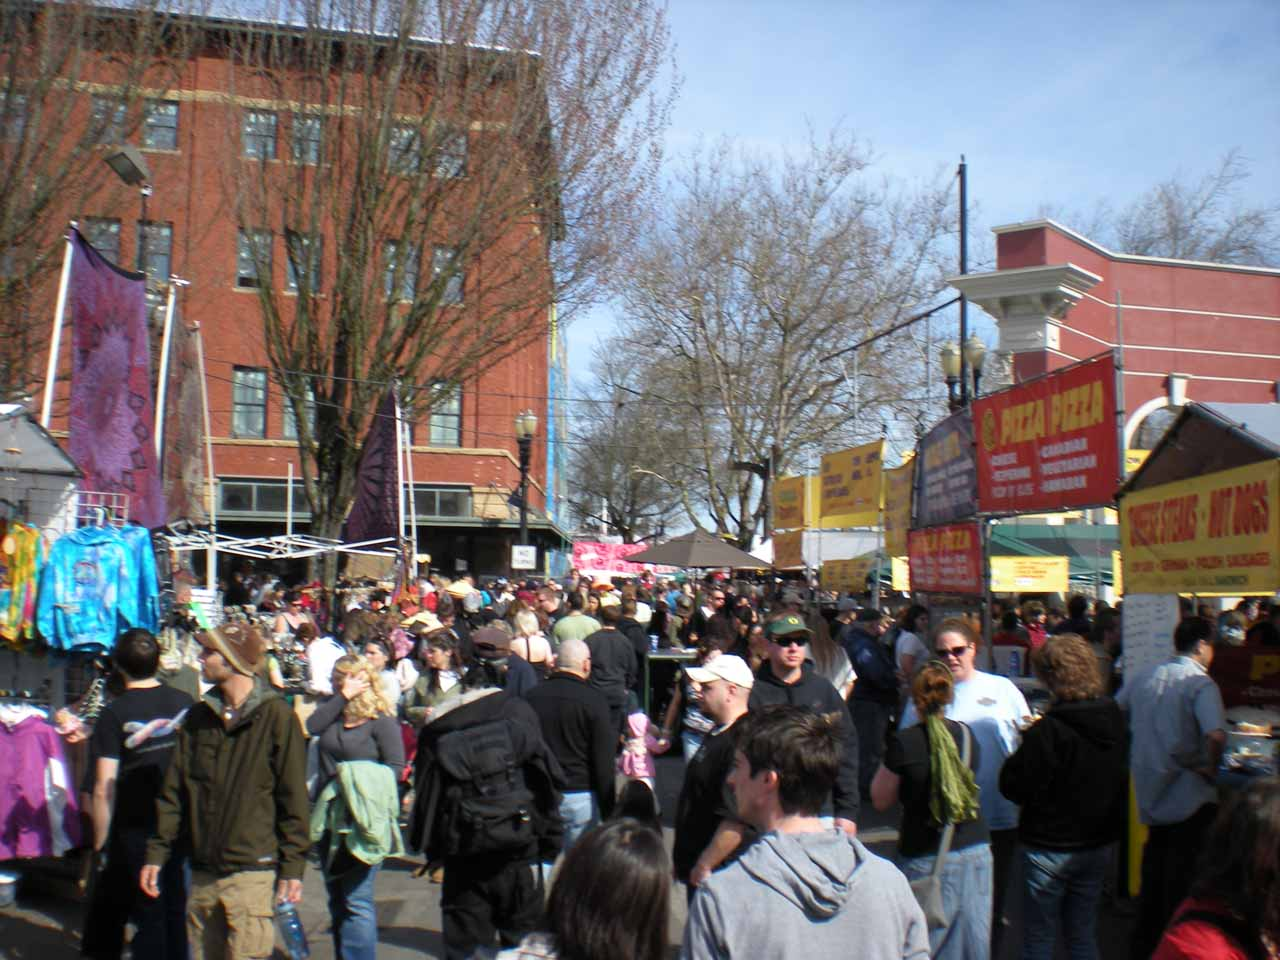 The Portland Saturday Market